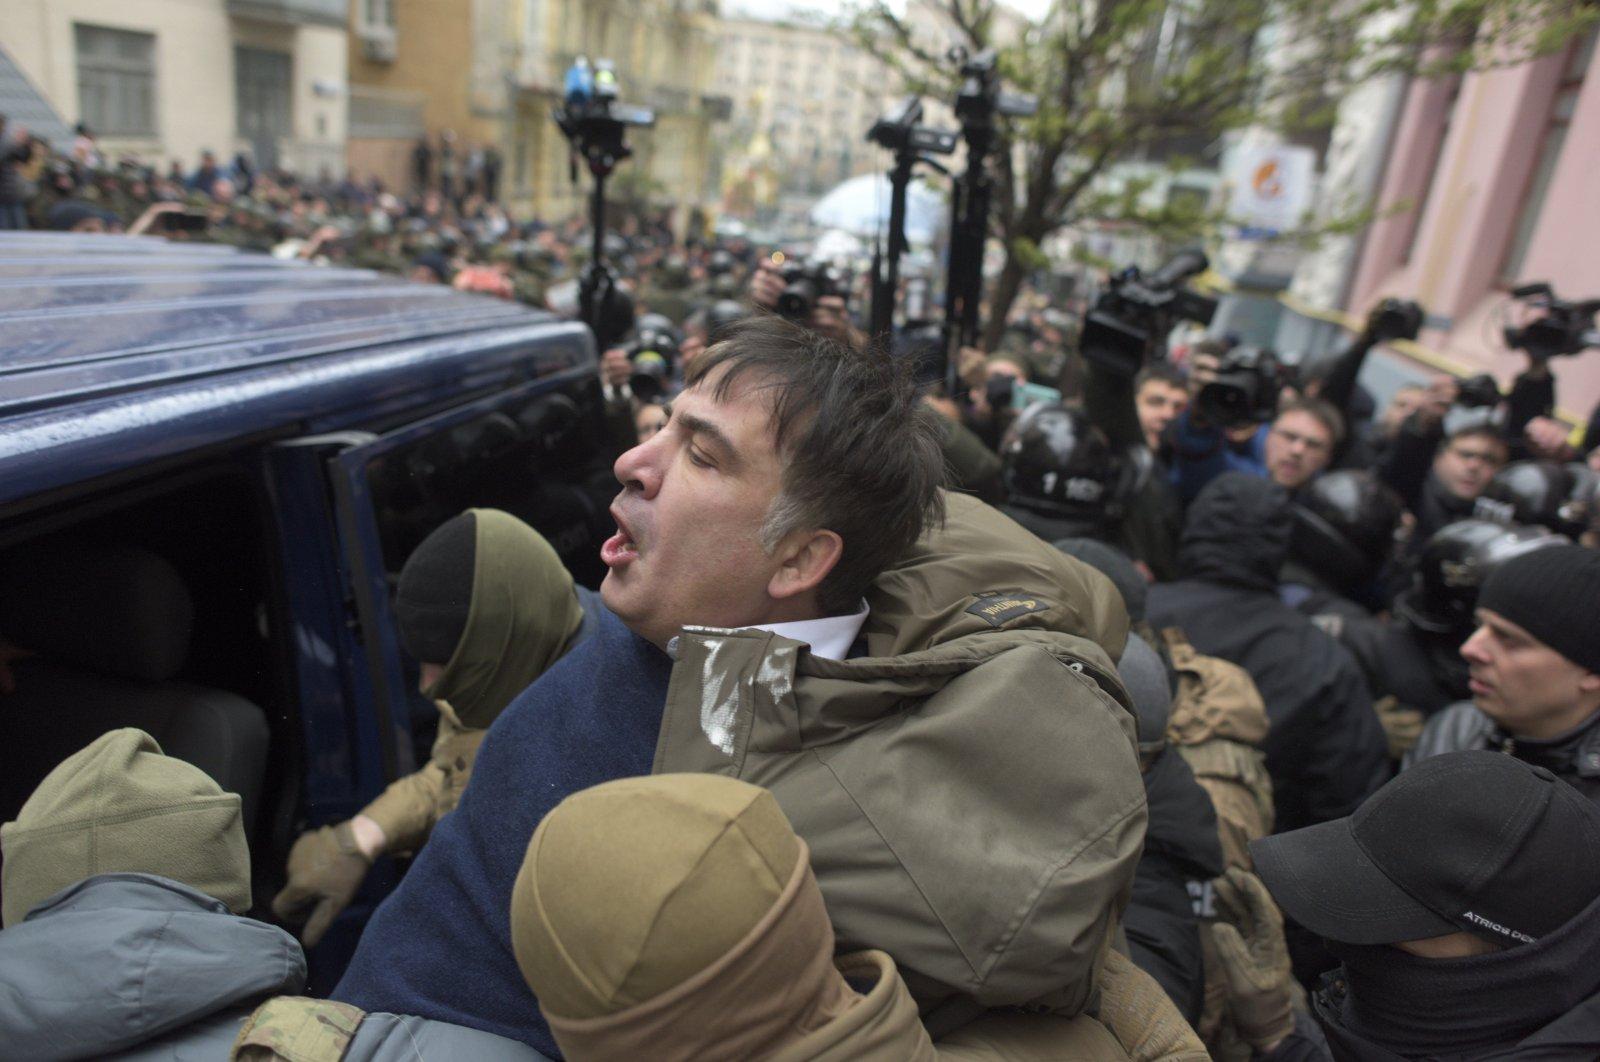 Ukrainian Security Service officers detain Mikheil Saakashvili at his house in Kyiv, Ukraine, Dec. 5, 2017. (AP Photo)